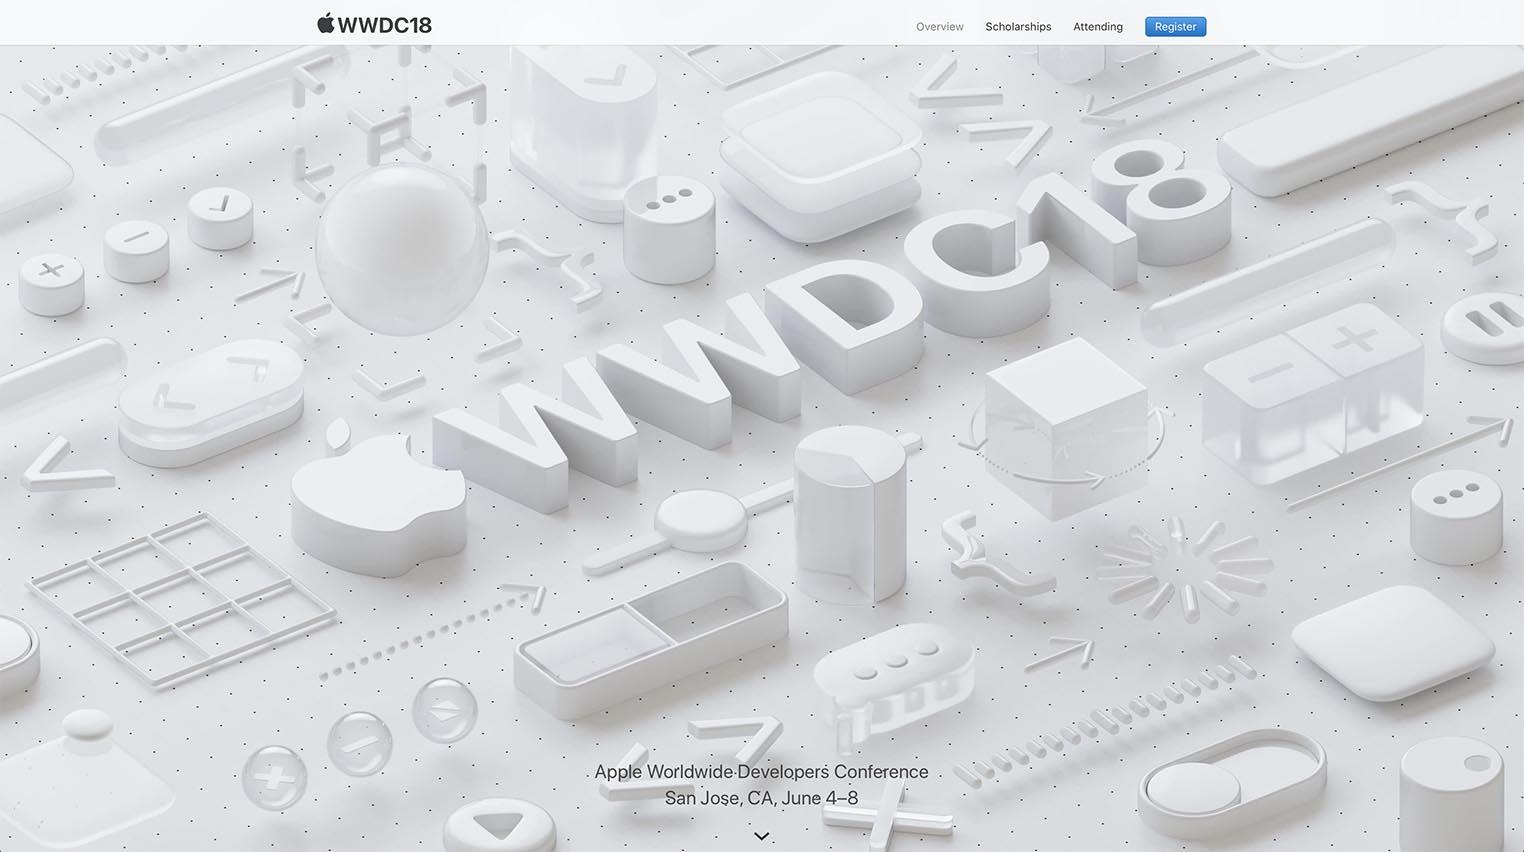 WWDC 2018 visuel